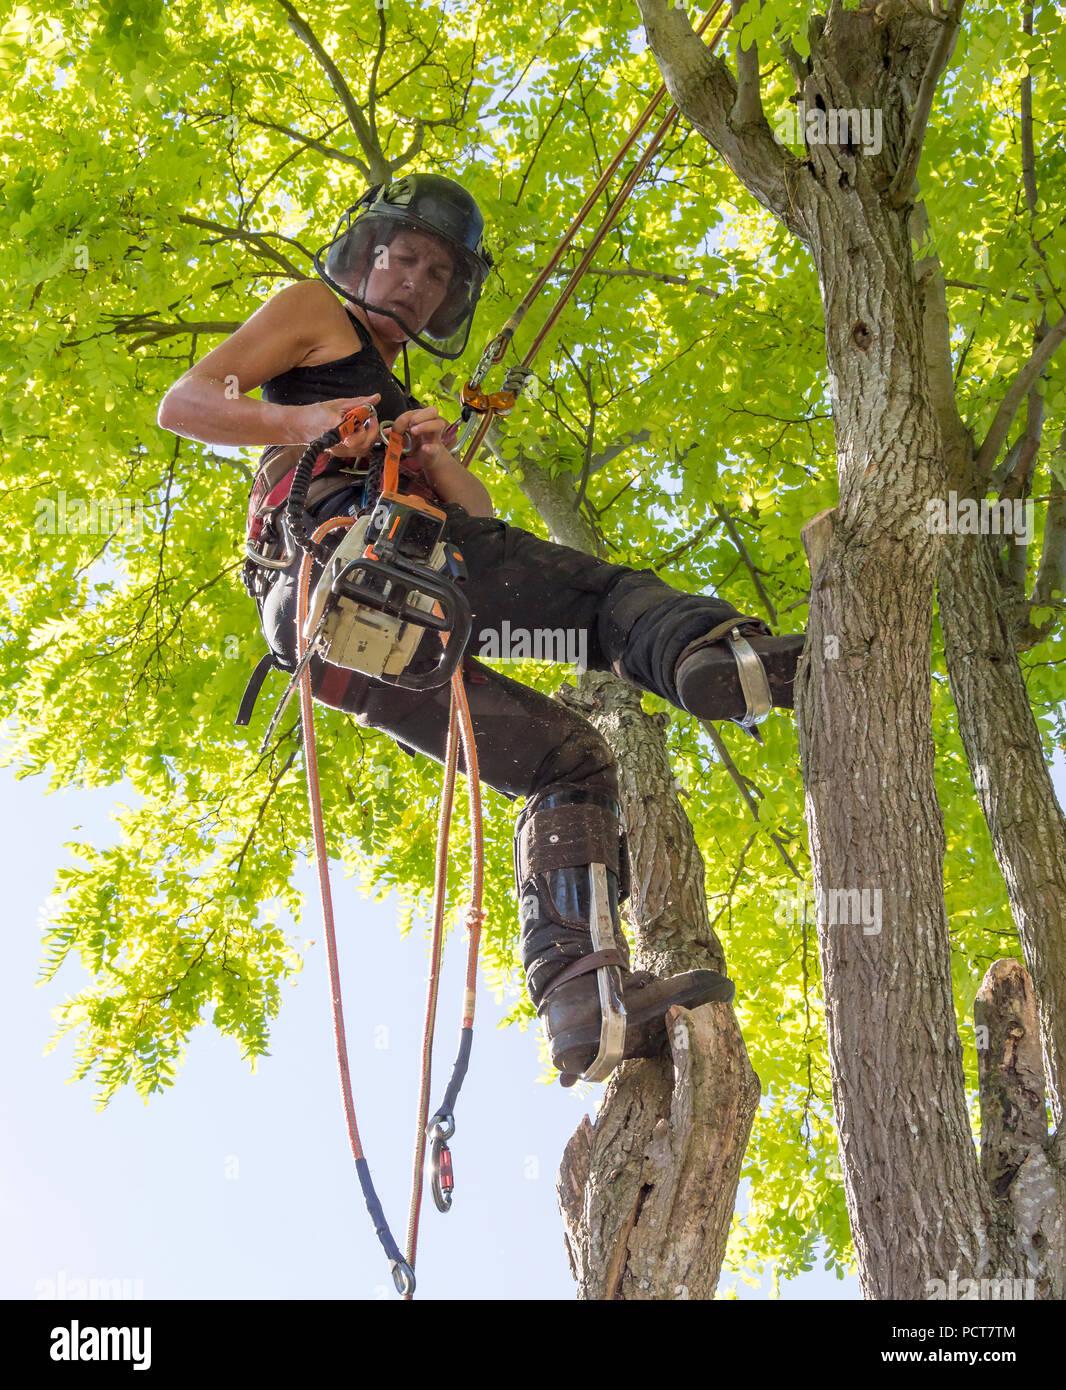 Arborist hembra listo para usar una motosierra Imagen De Stock